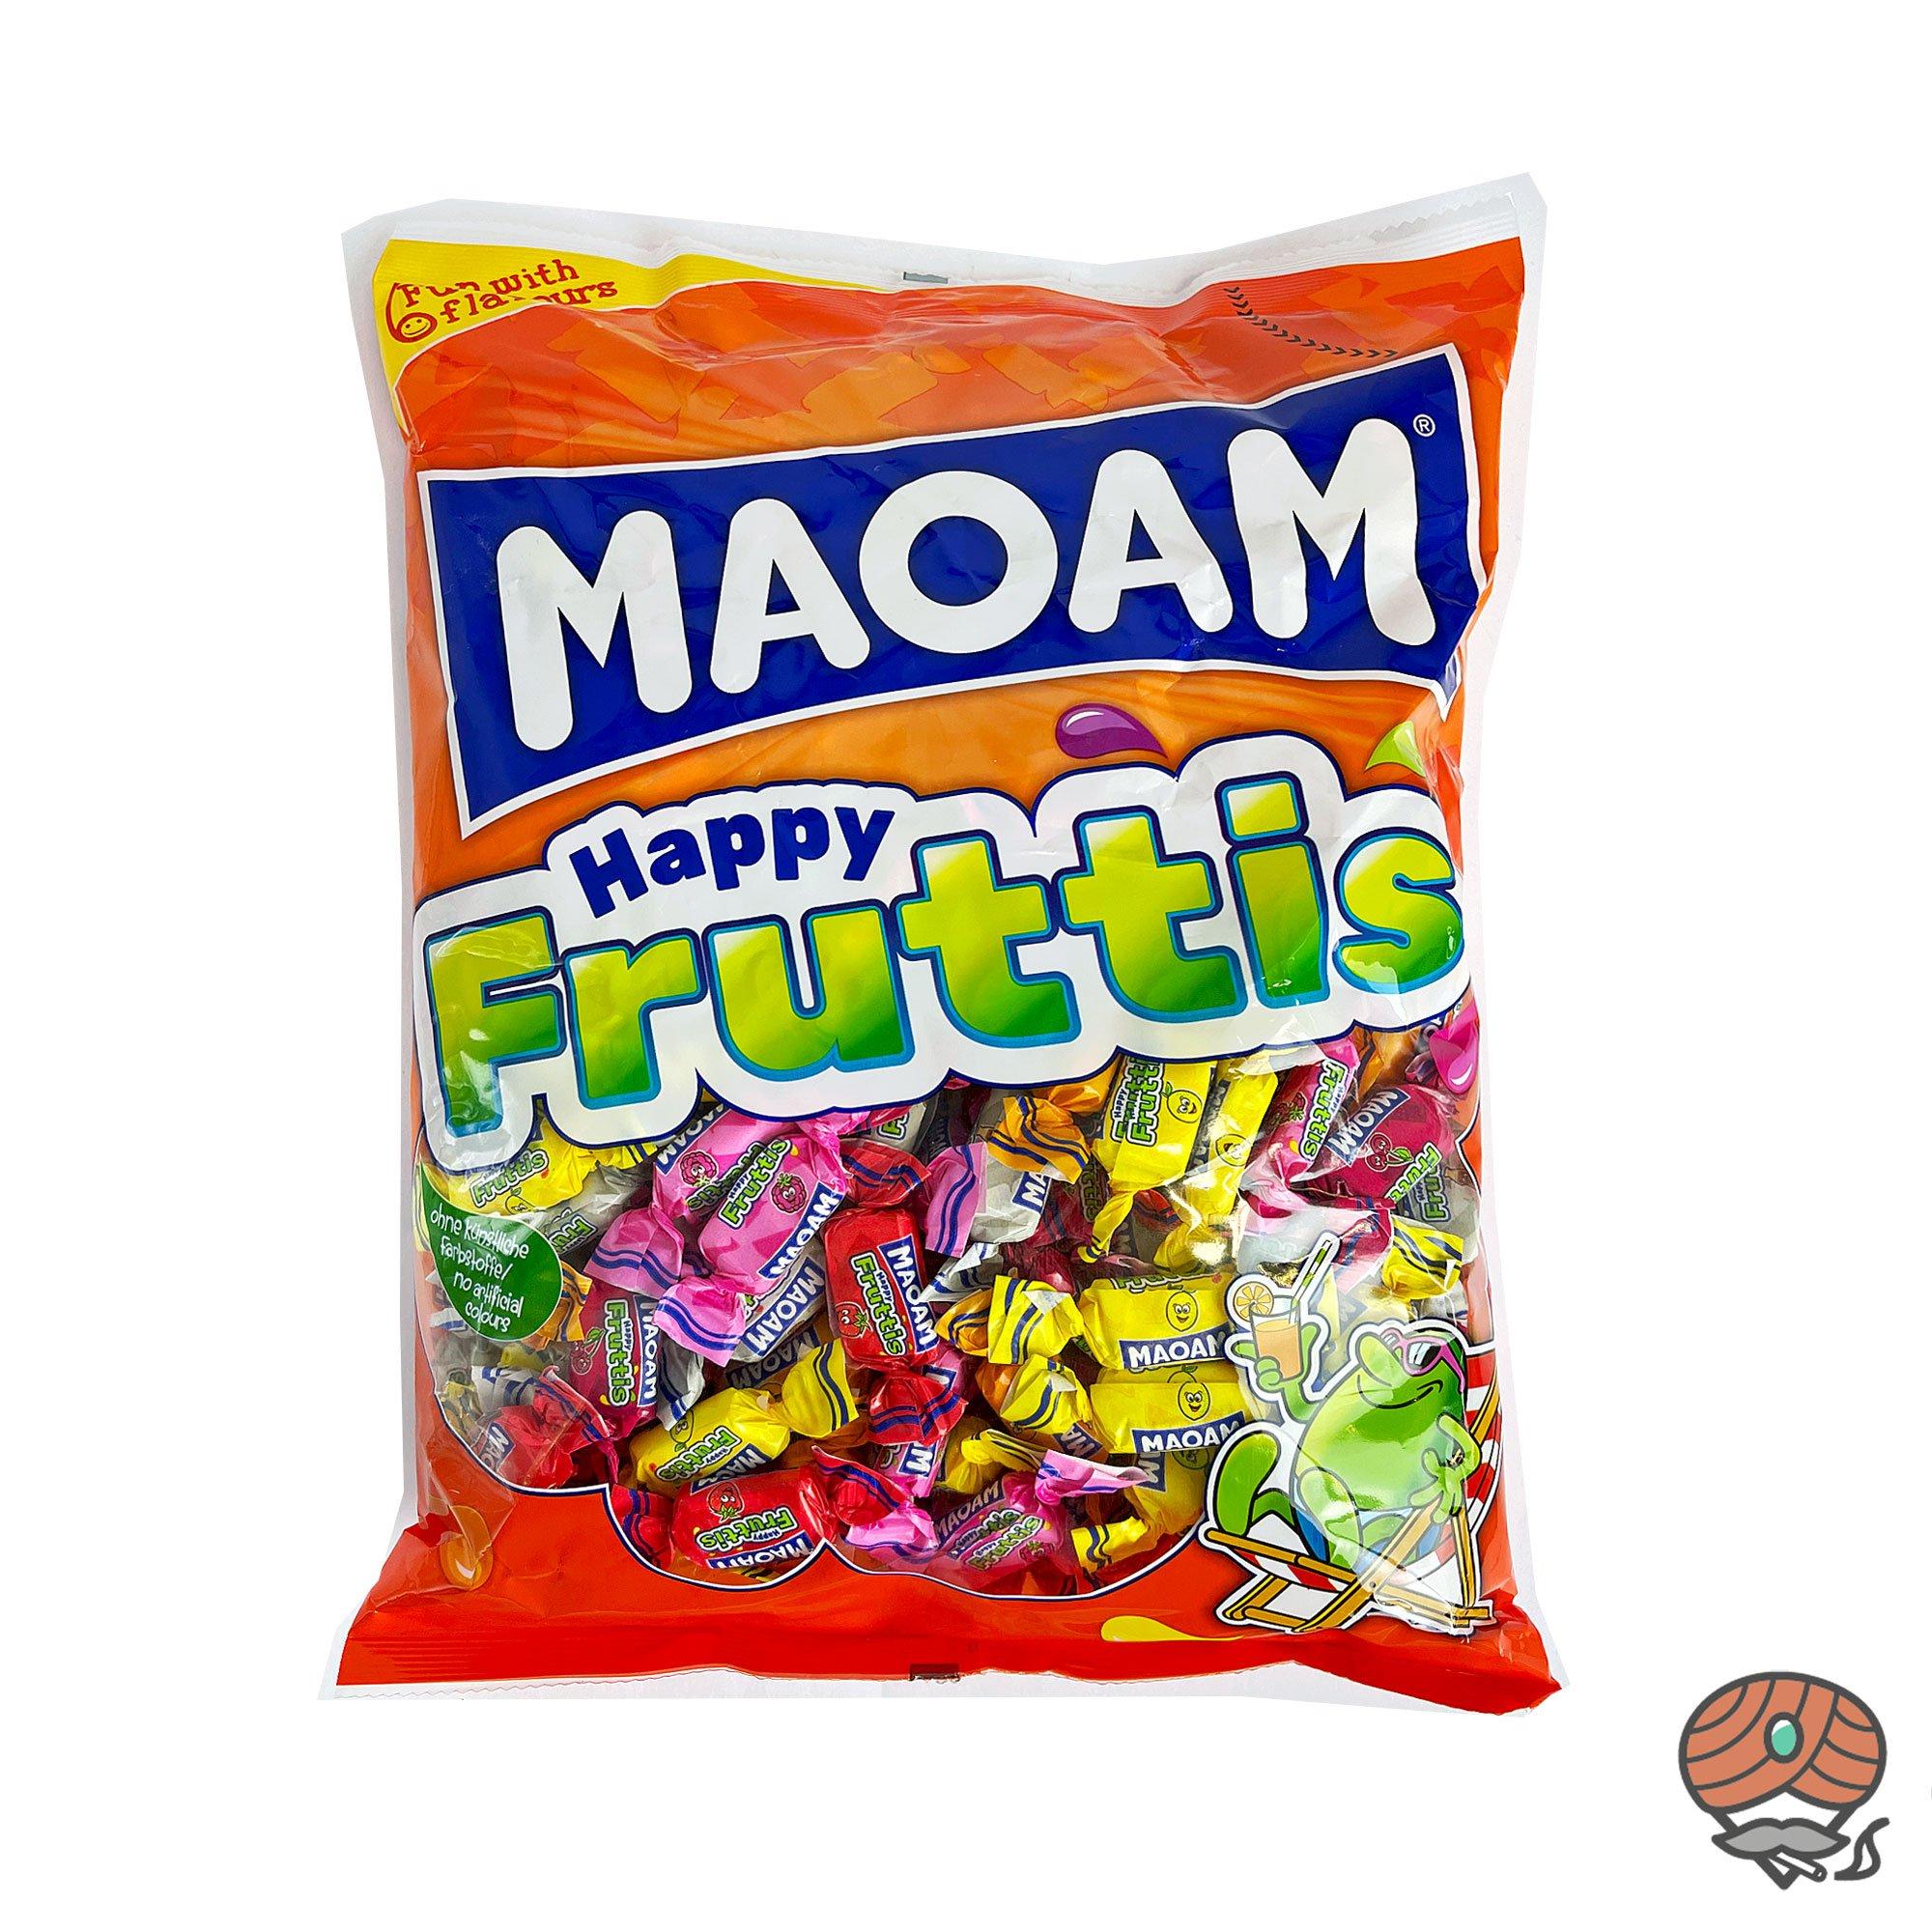 MAOAM Happy Fruttis Kaubonbons 1000g